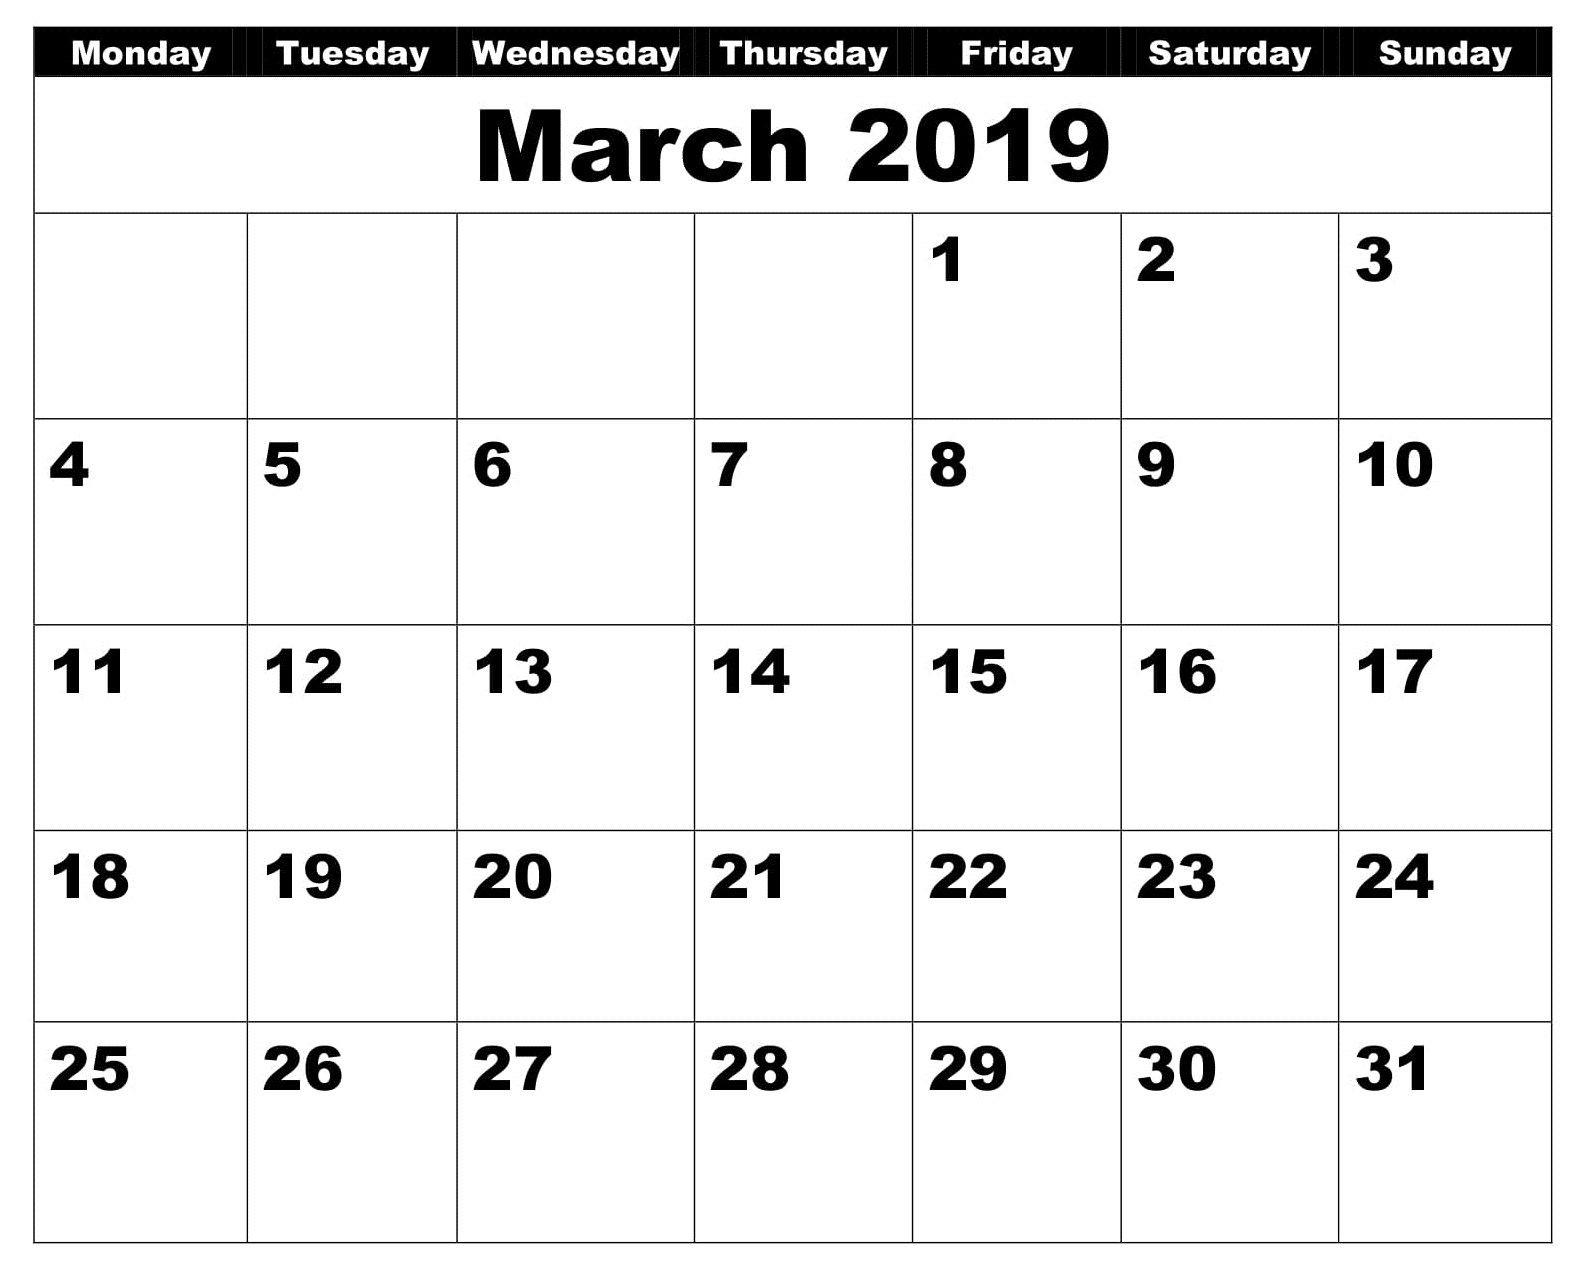 Blank March 2019 Calendar Business | 2019 Calendar Blank Sunday Through Saturday Calendar